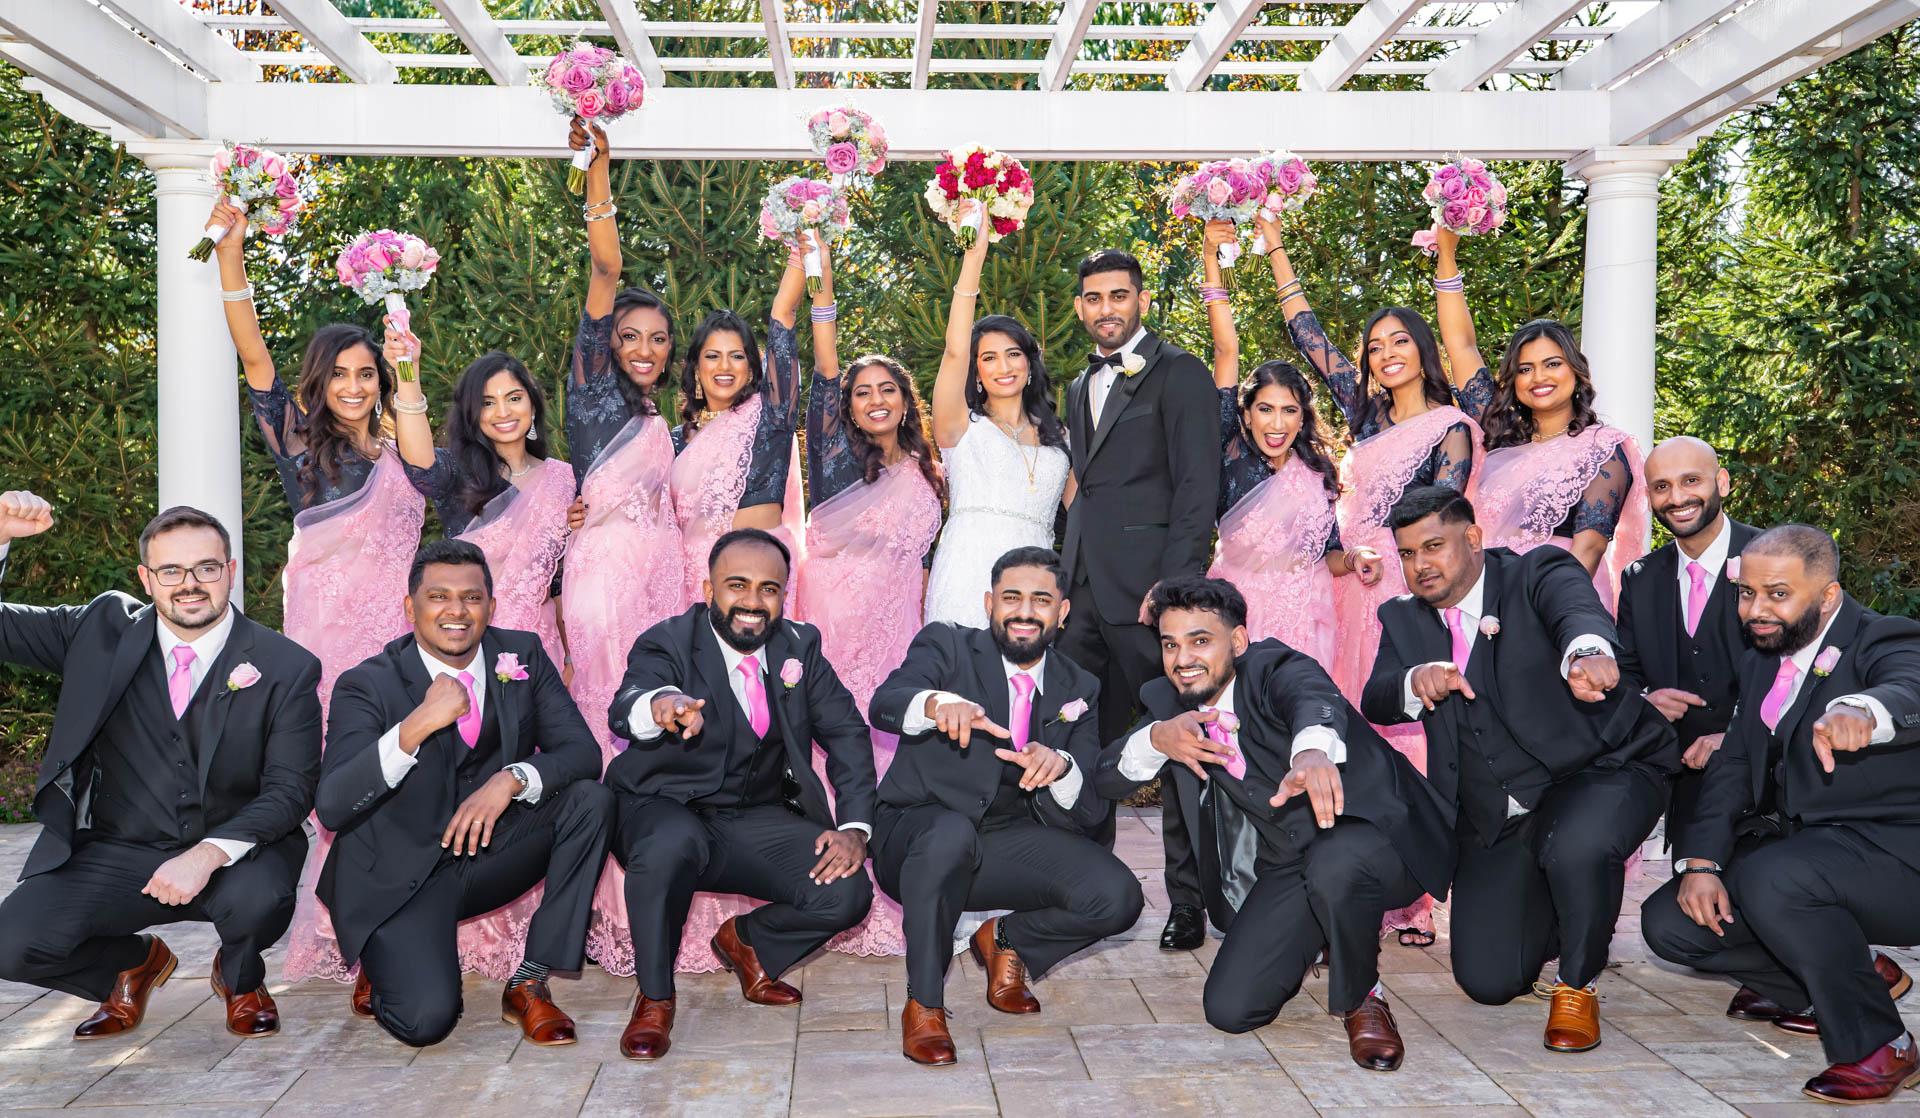 WESTMOUNT COUNTRY CLUB INDIAN WEDDING 21